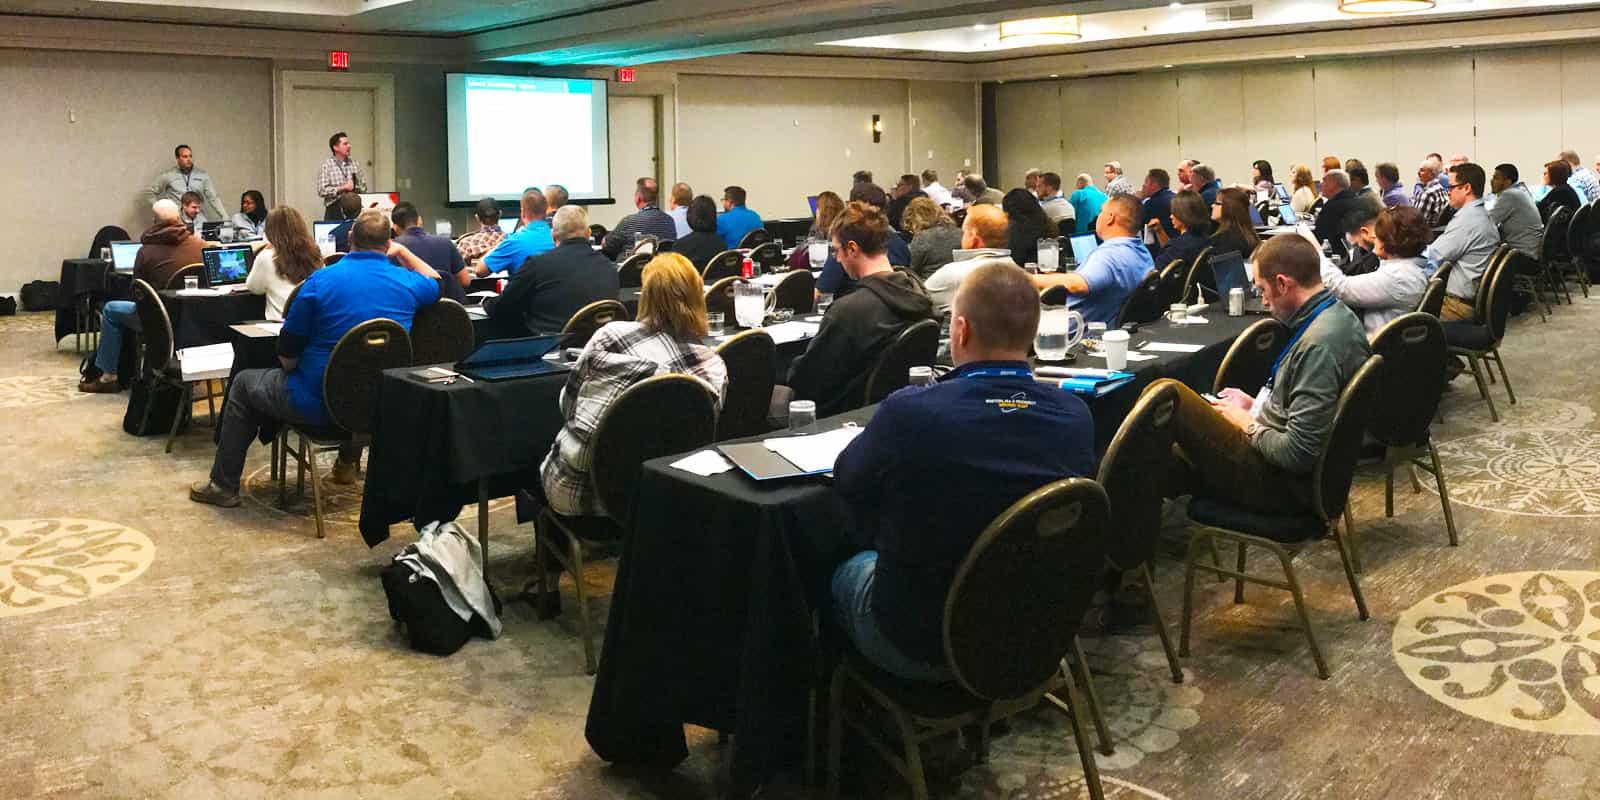 Deacom User Conference Large Session